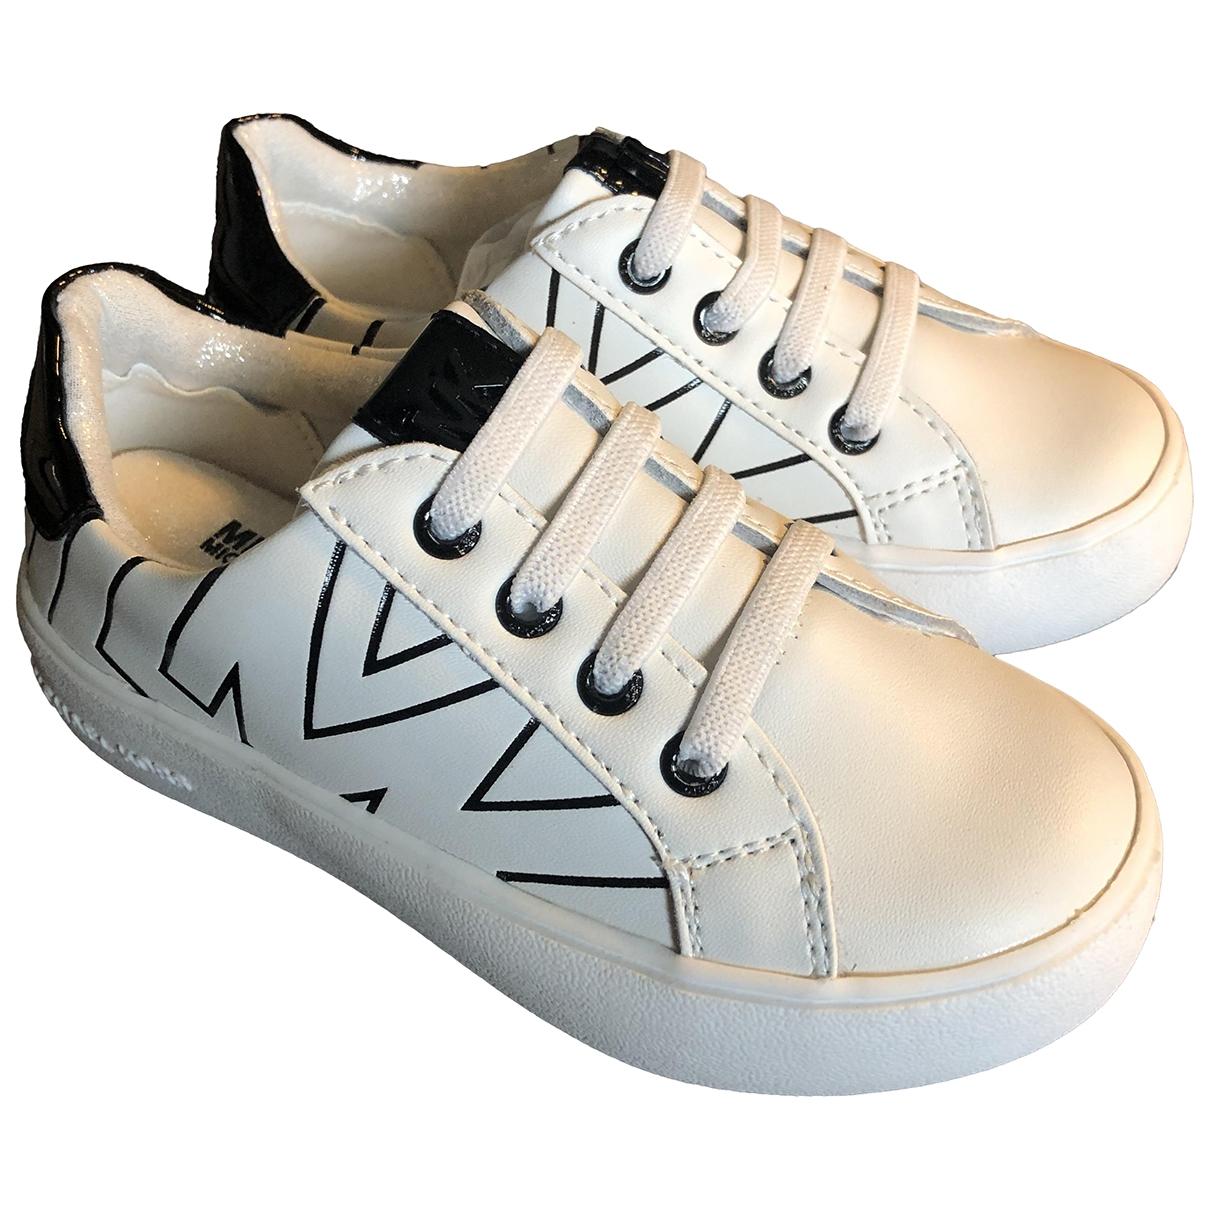 Michael Kors \N White Leather Trainers for Kids 24 EU